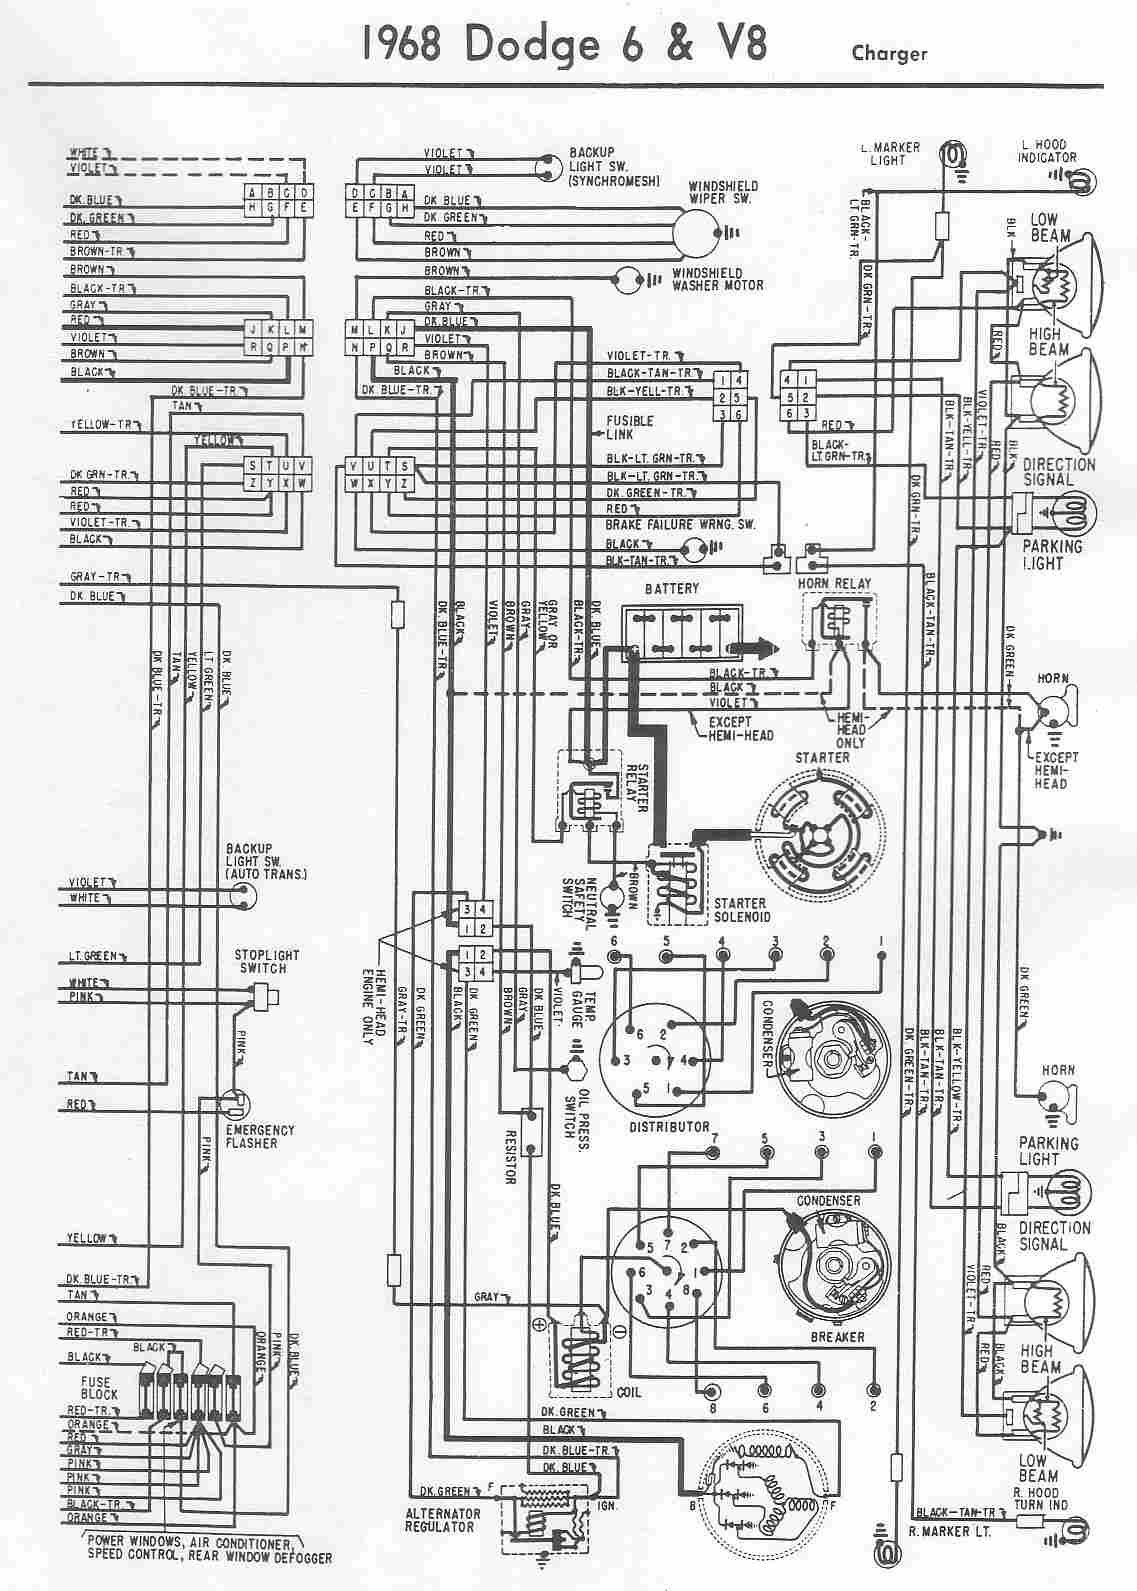 Power Ke Wiring Diagram Free Download Schematic - Illustration Of ...